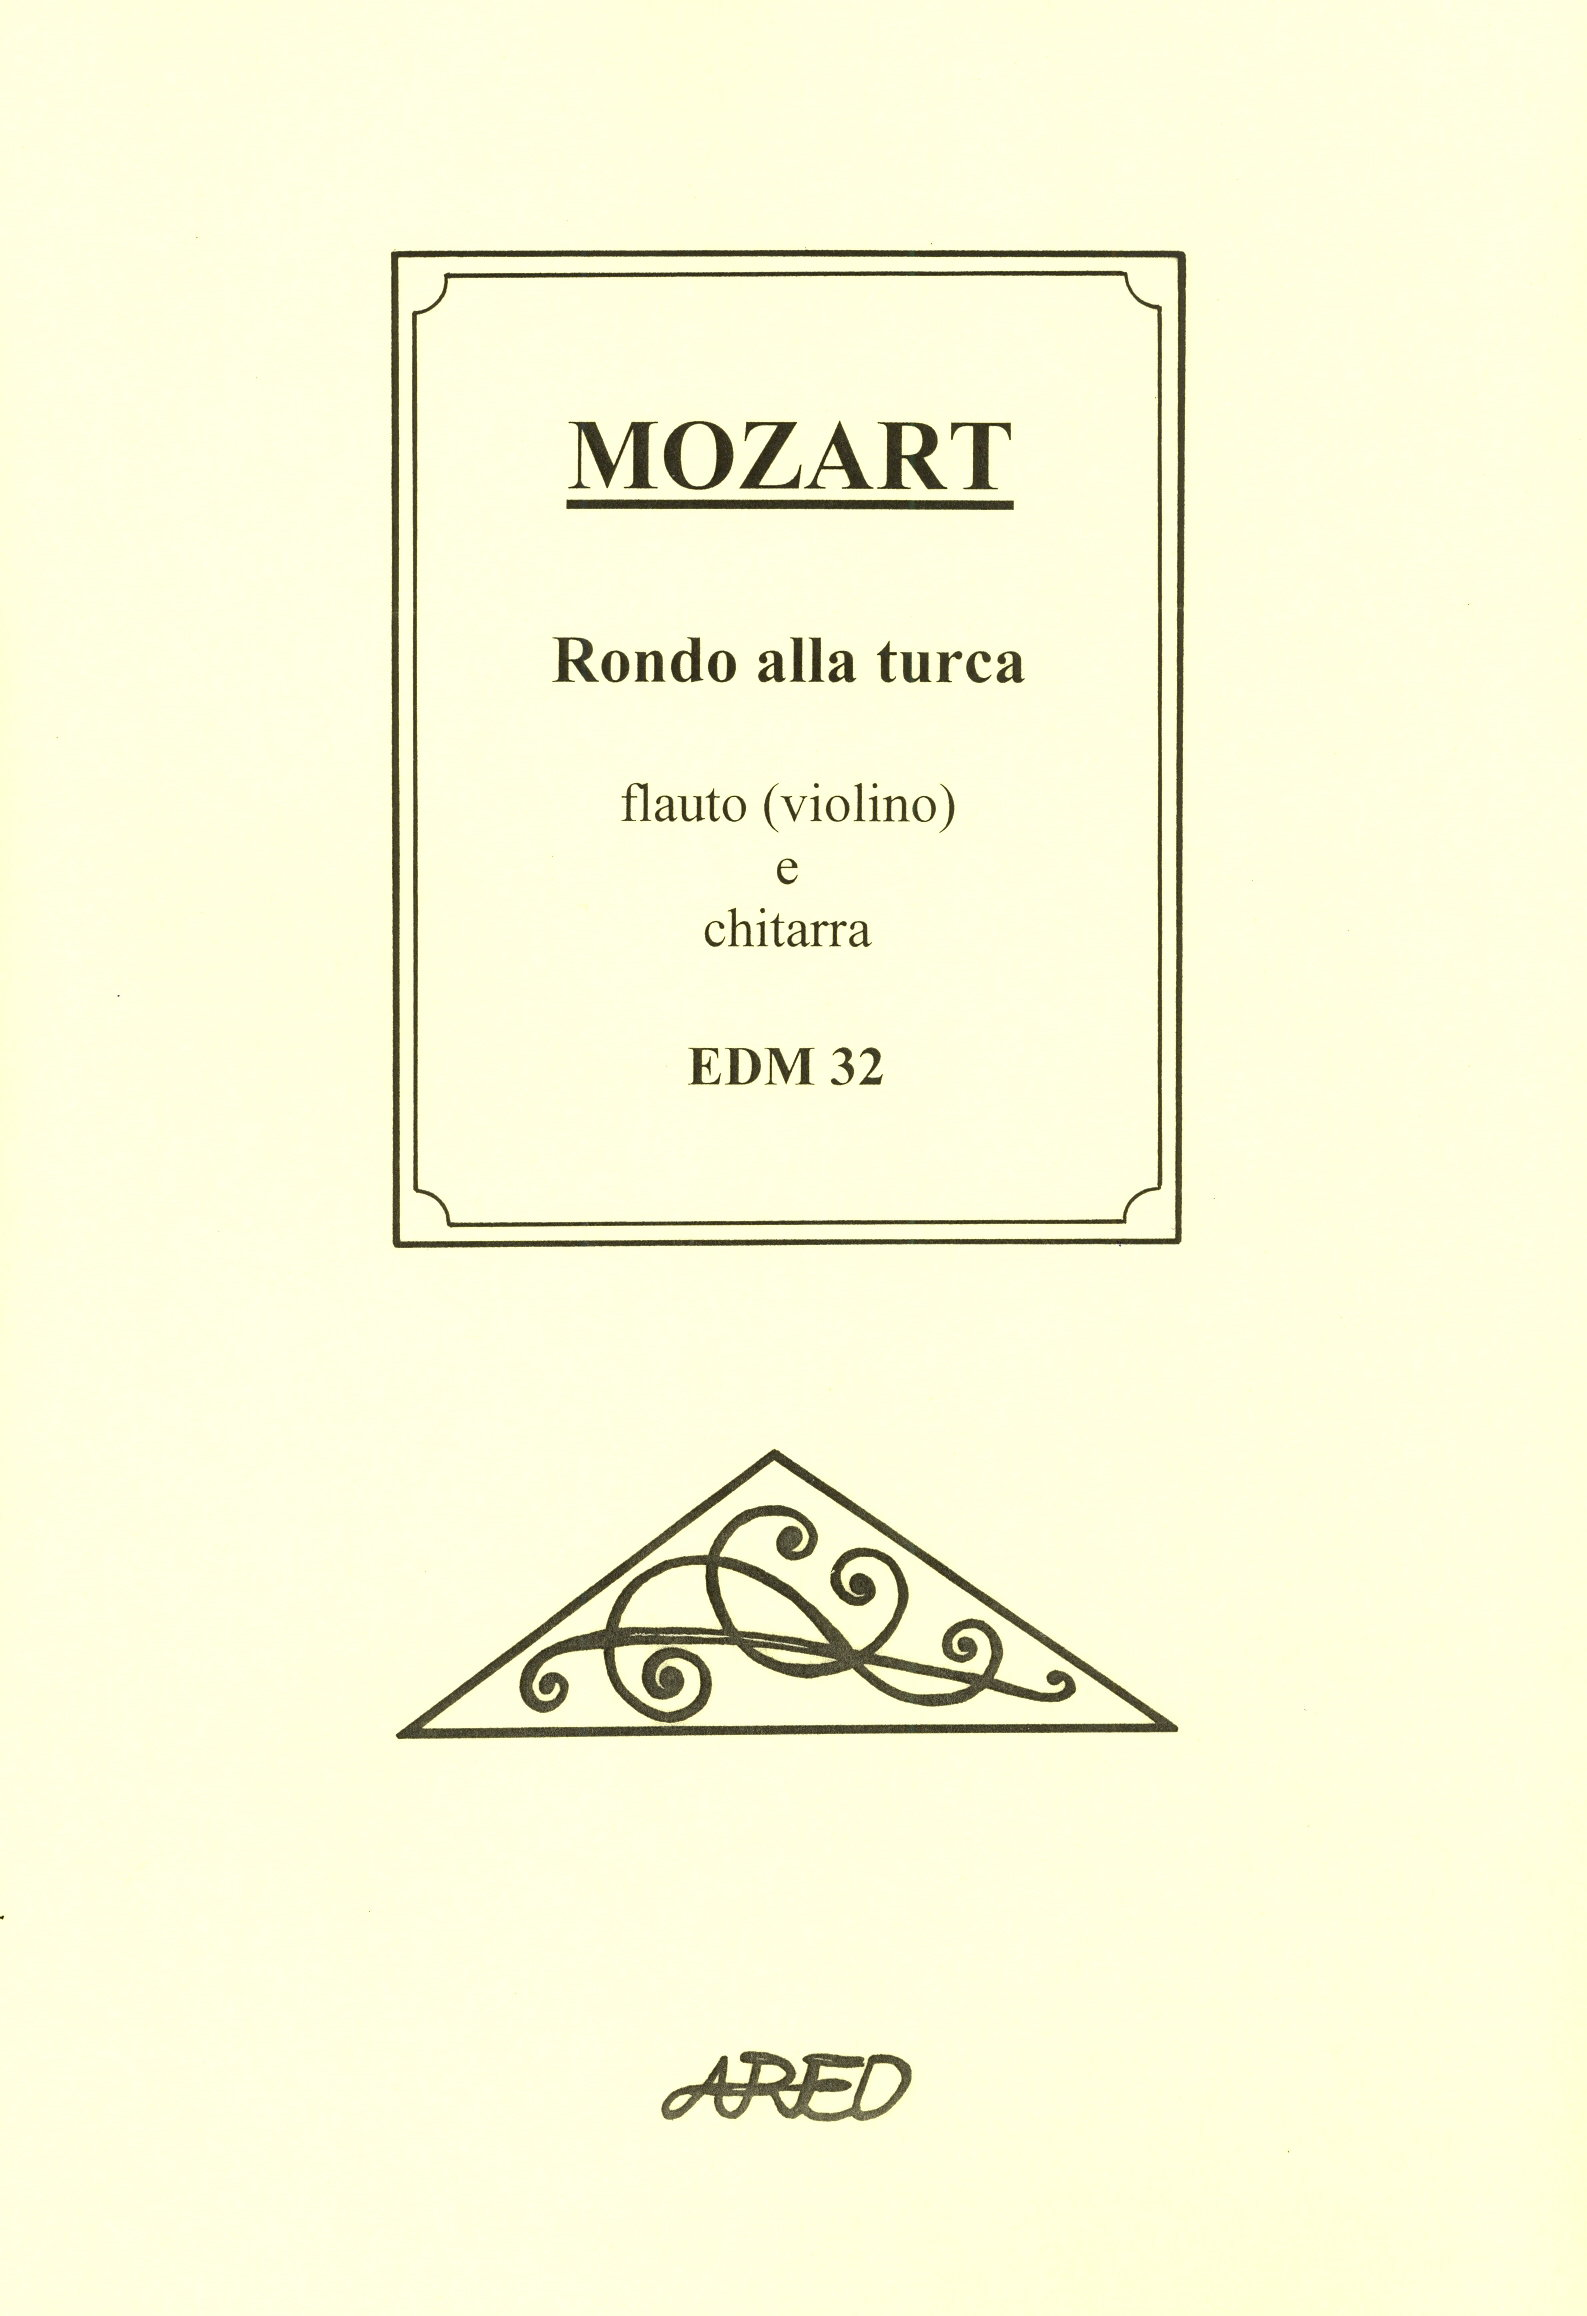 Alla Turca Mozart mozart - rondo alla turca / flute (violin) + guitar enoty.eu